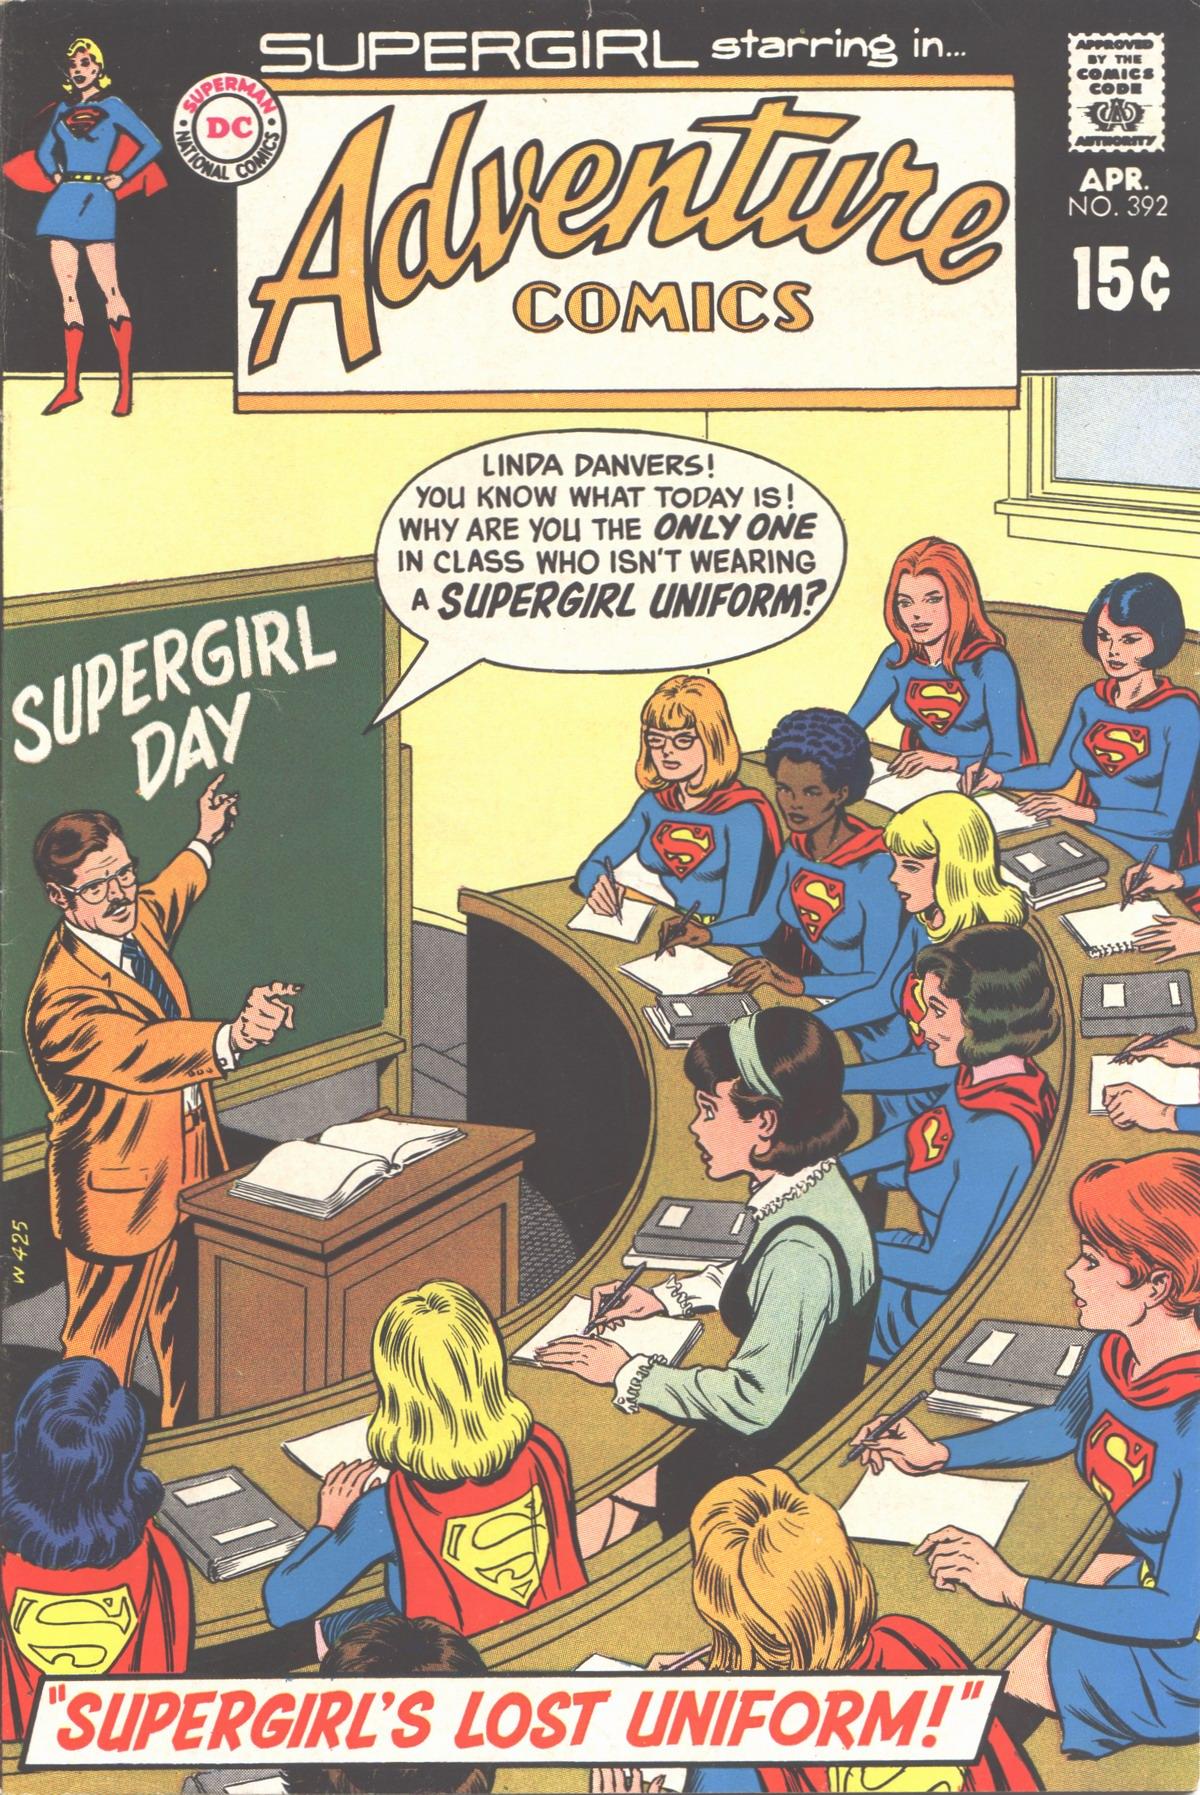 Read online Adventure Comics (1938) comic -  Issue #392 - 1